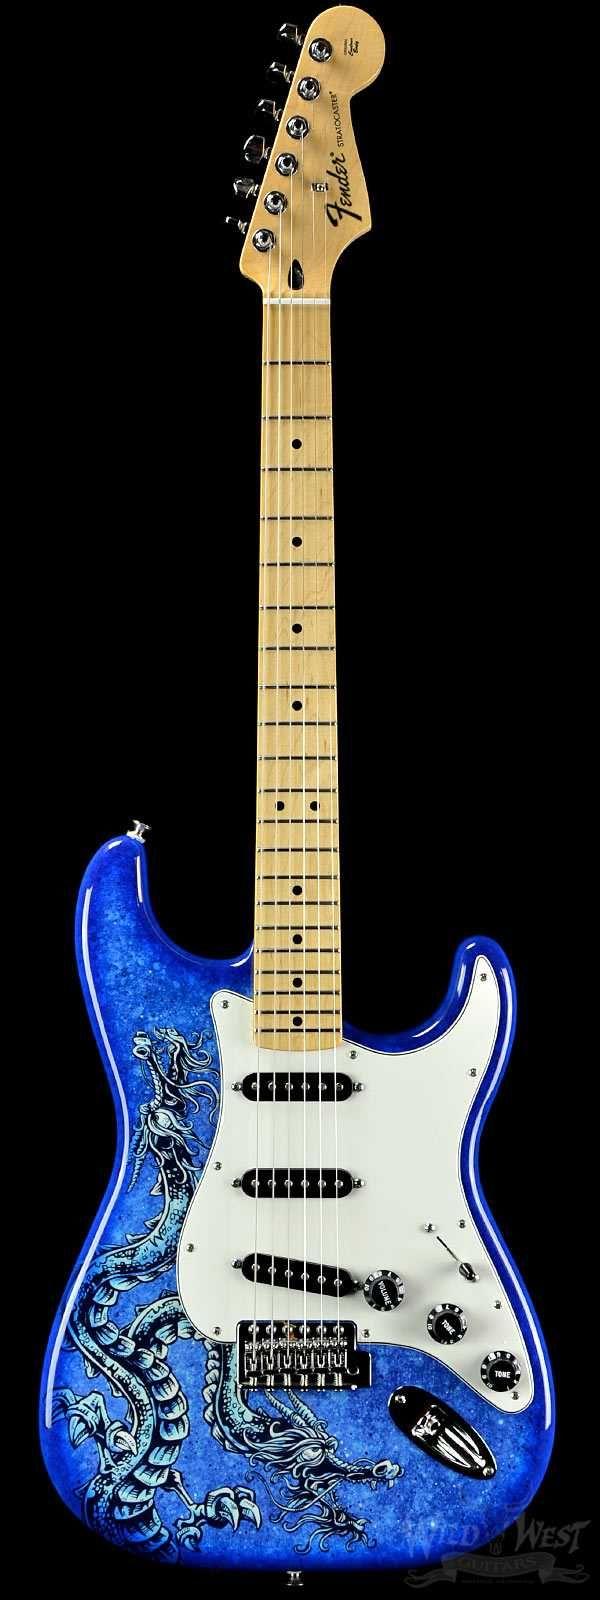 147 best strat images on Pinterest   Guitars, Custom guitars and ...